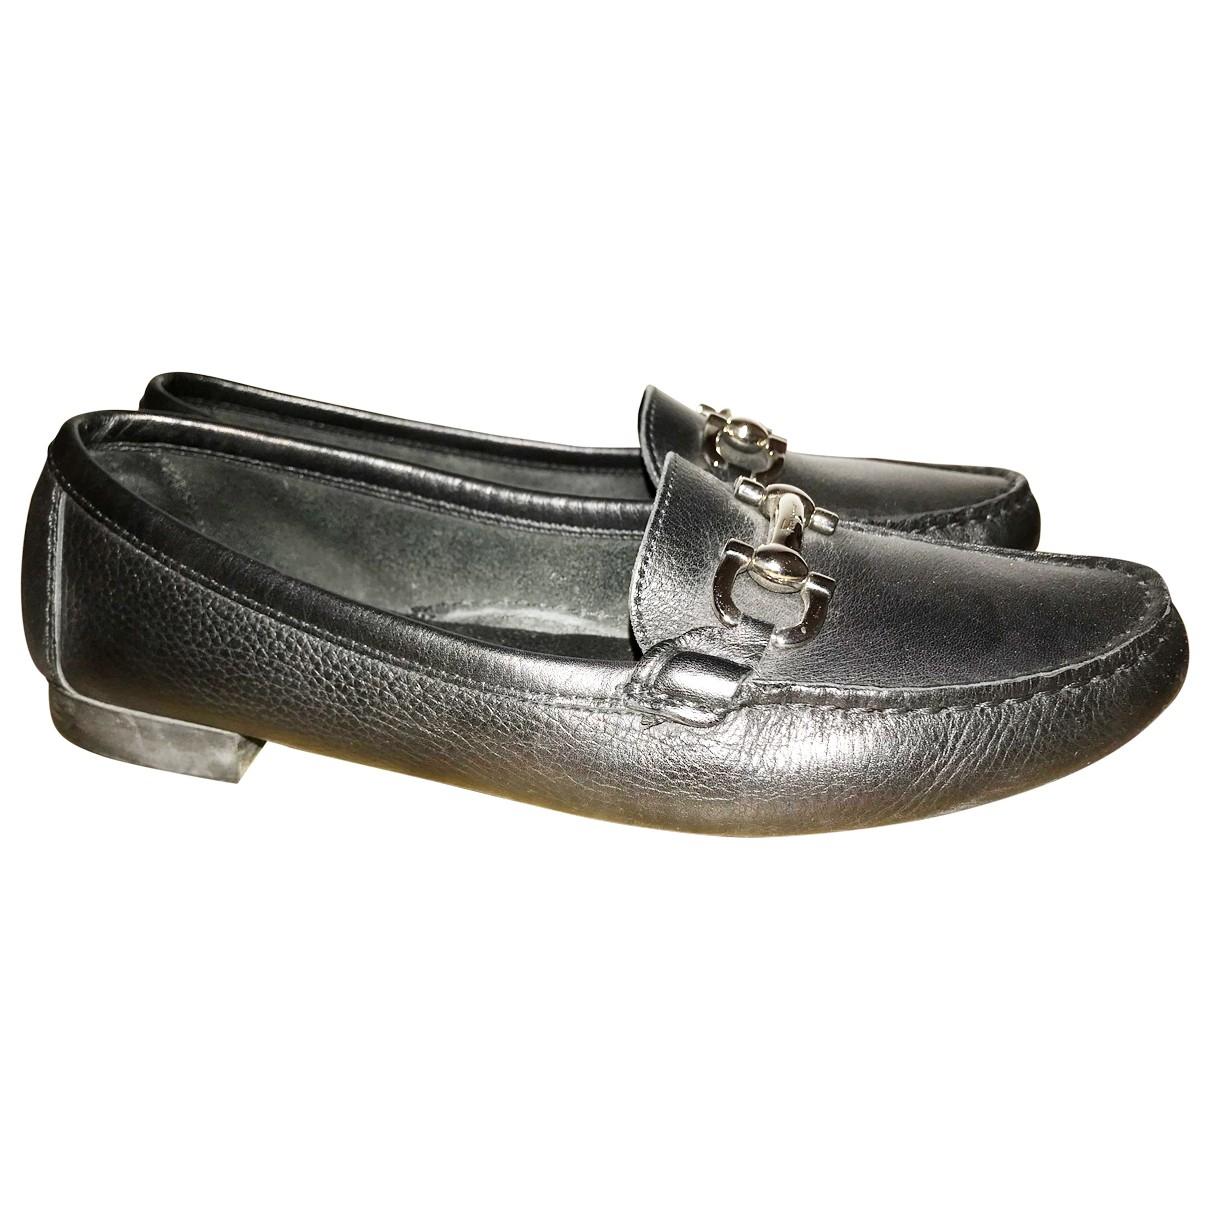 Salvatore Ferragamo \N Black Leather Flats for Women 8 US